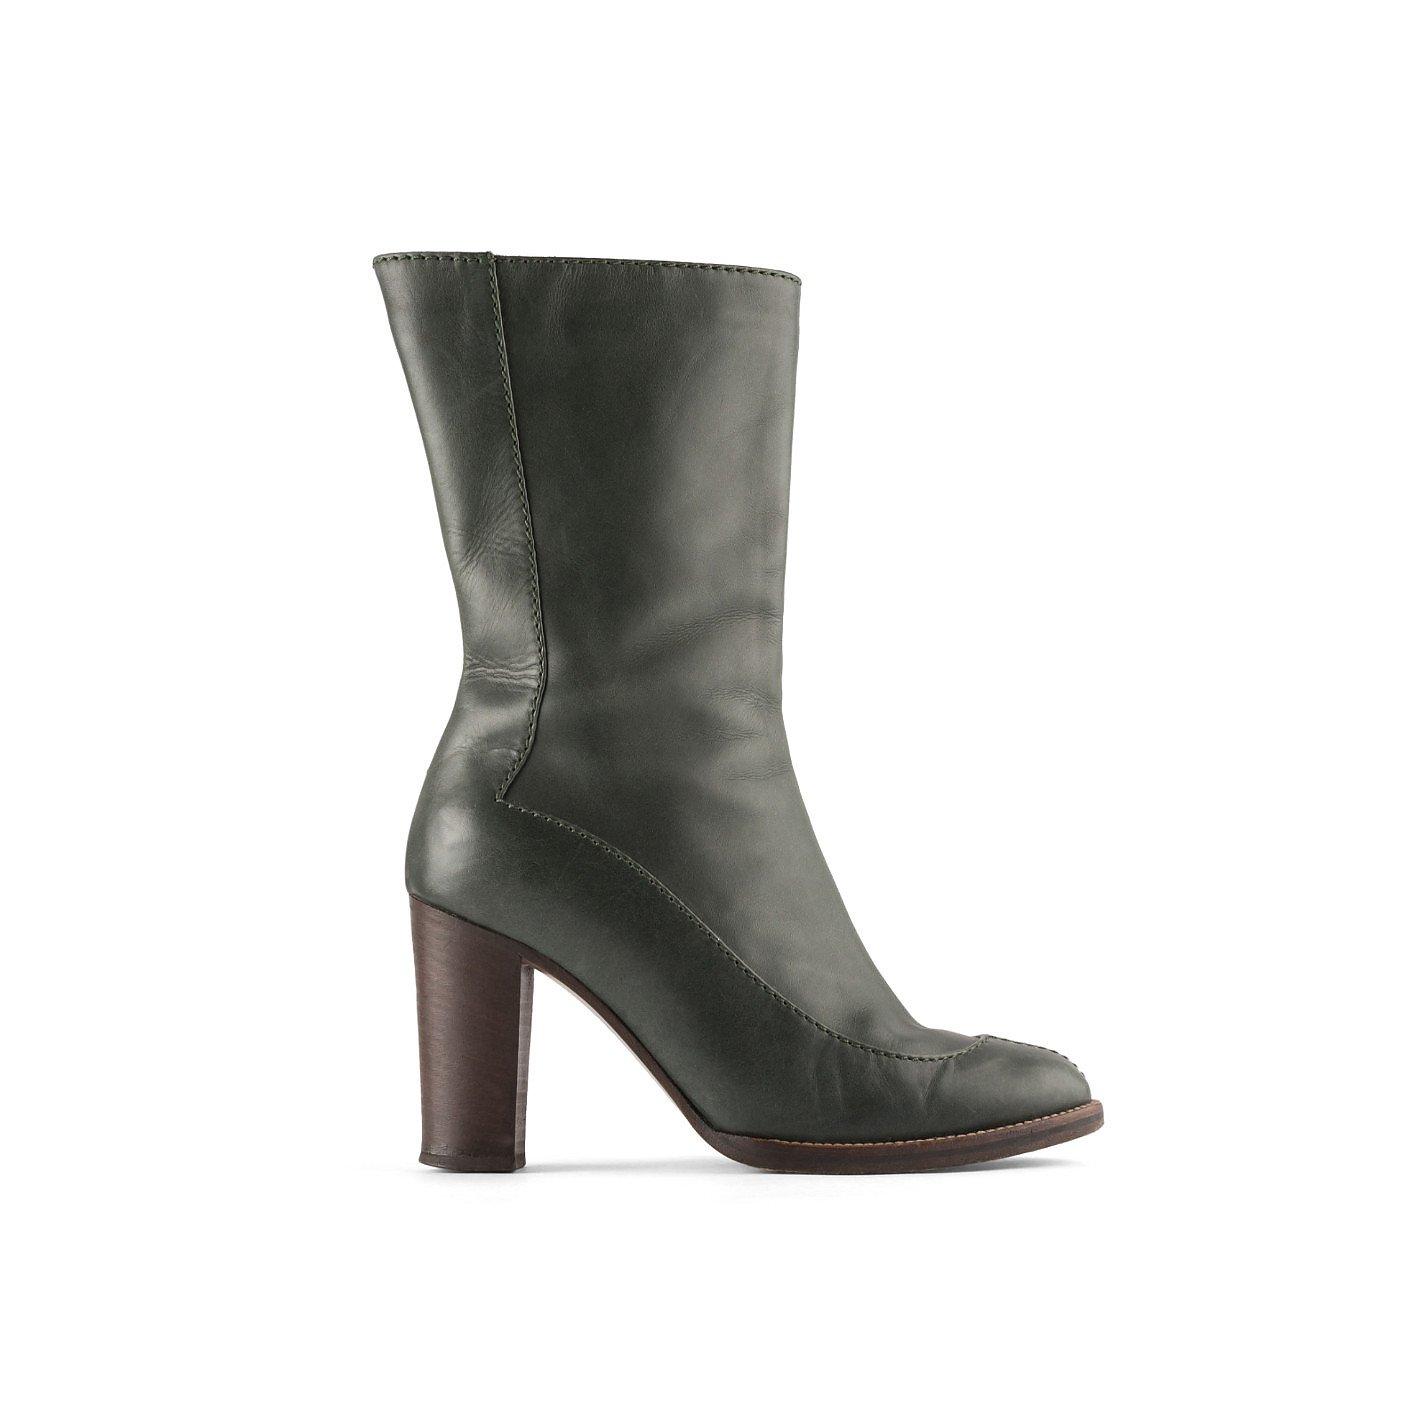 Marni Heeled Leather Boots